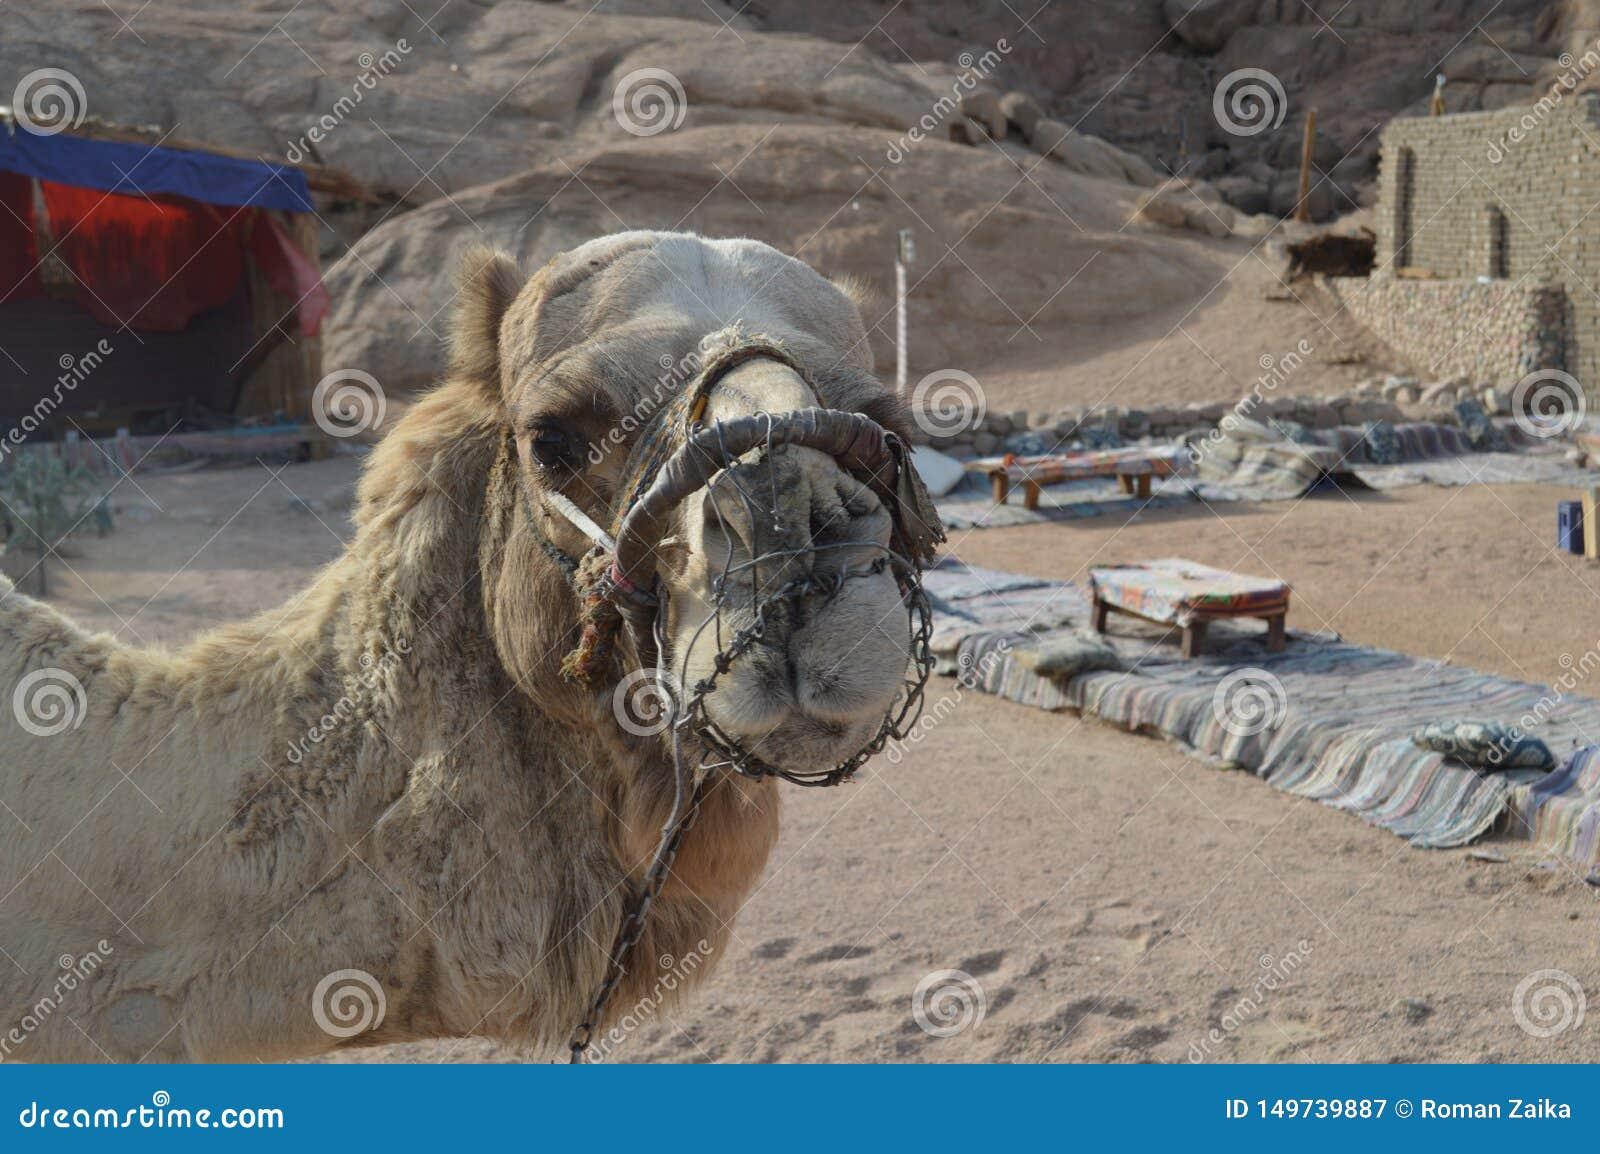 Tours- Camel ride at bedouin village